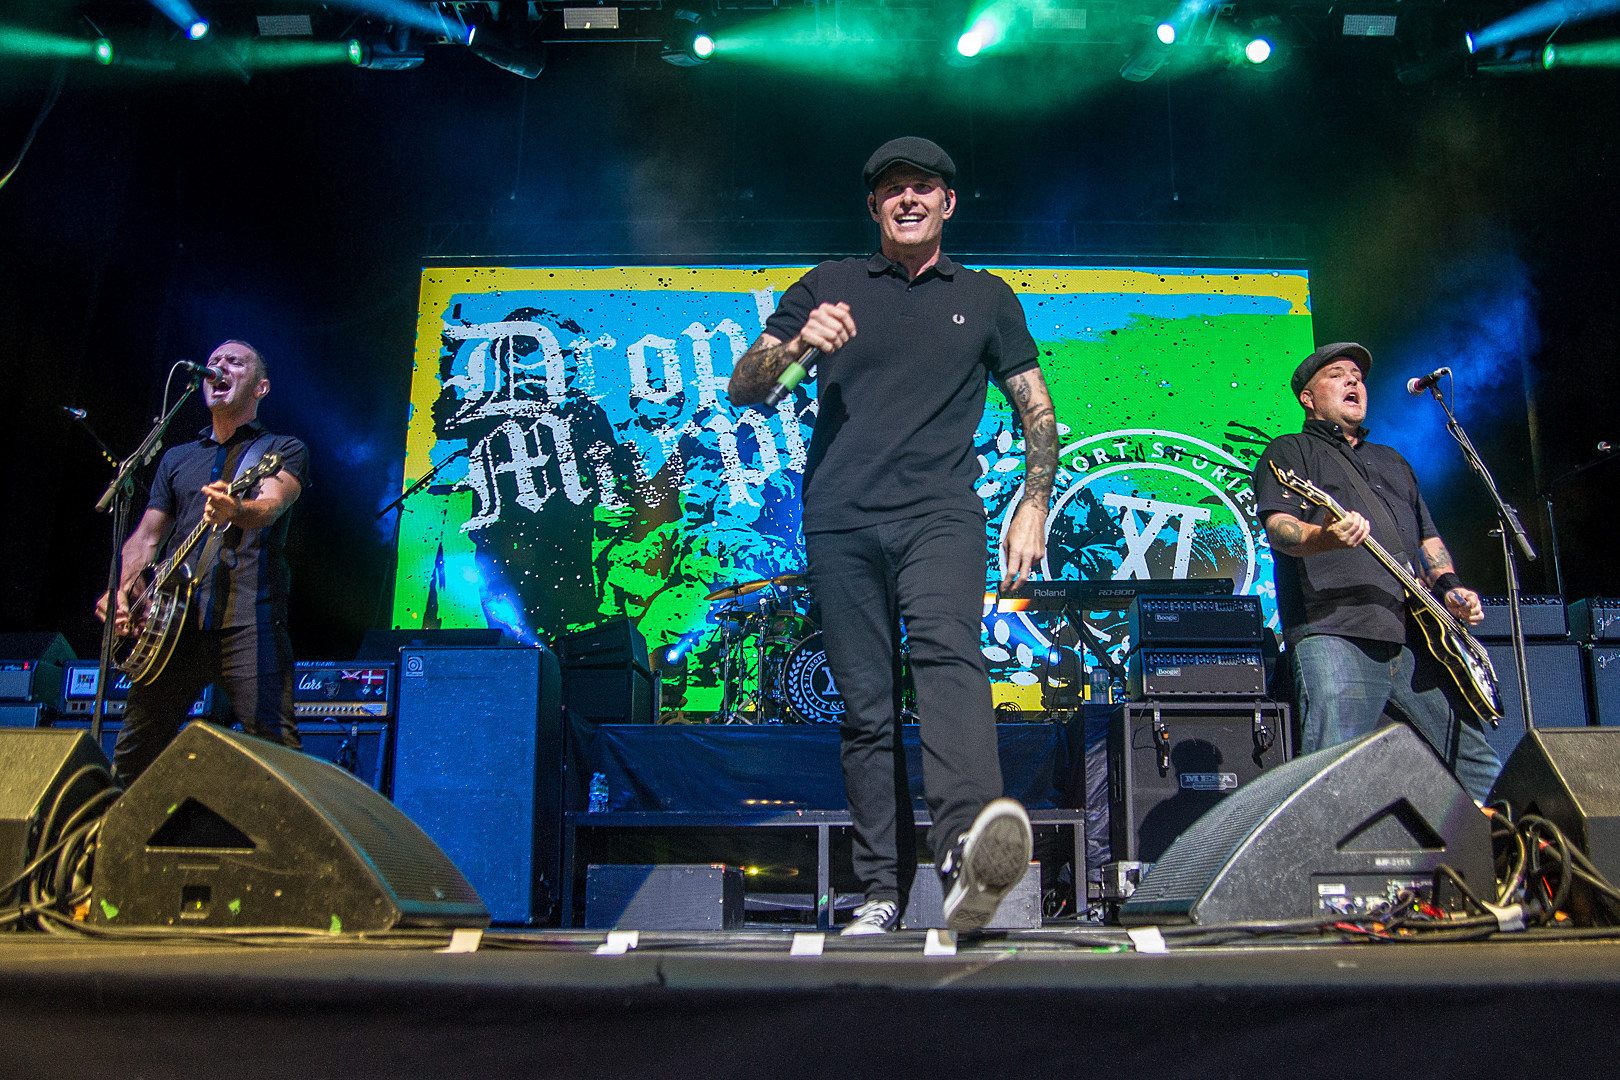 Dropkick Murphys Announce 2019 'St. Patrick's Day' North American Tour